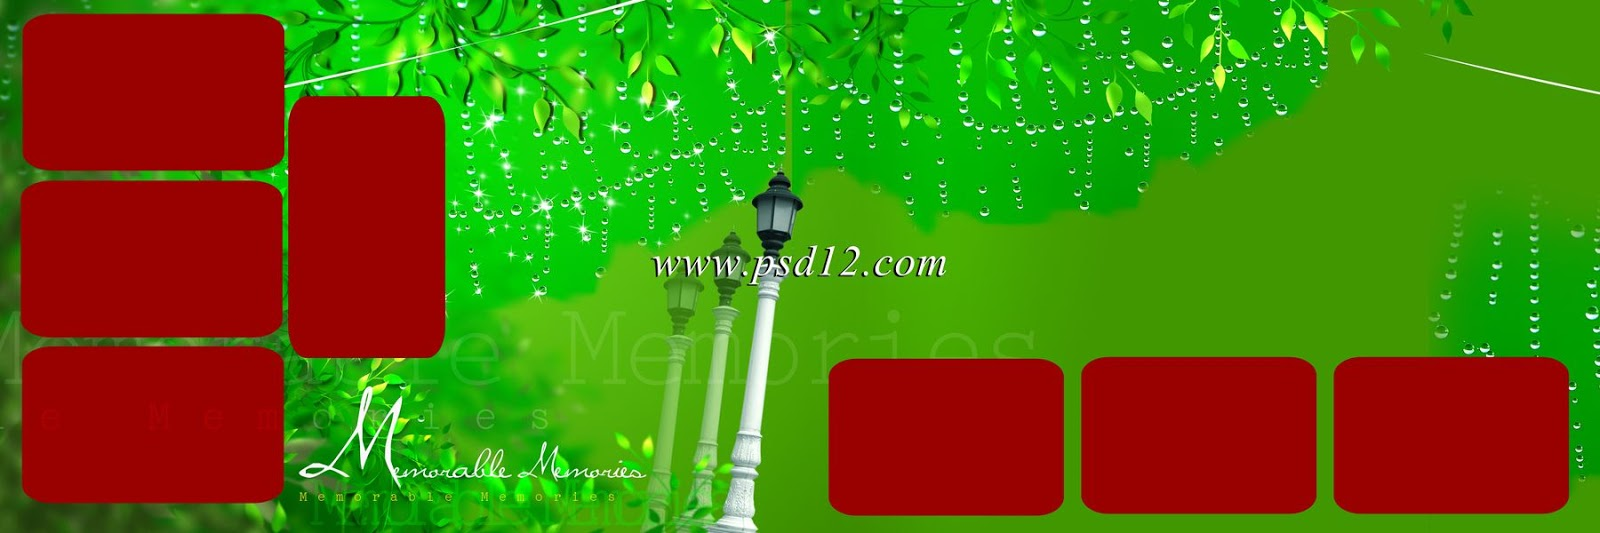 photoshop backgrounds 12x36 indian wedding album templates design 10